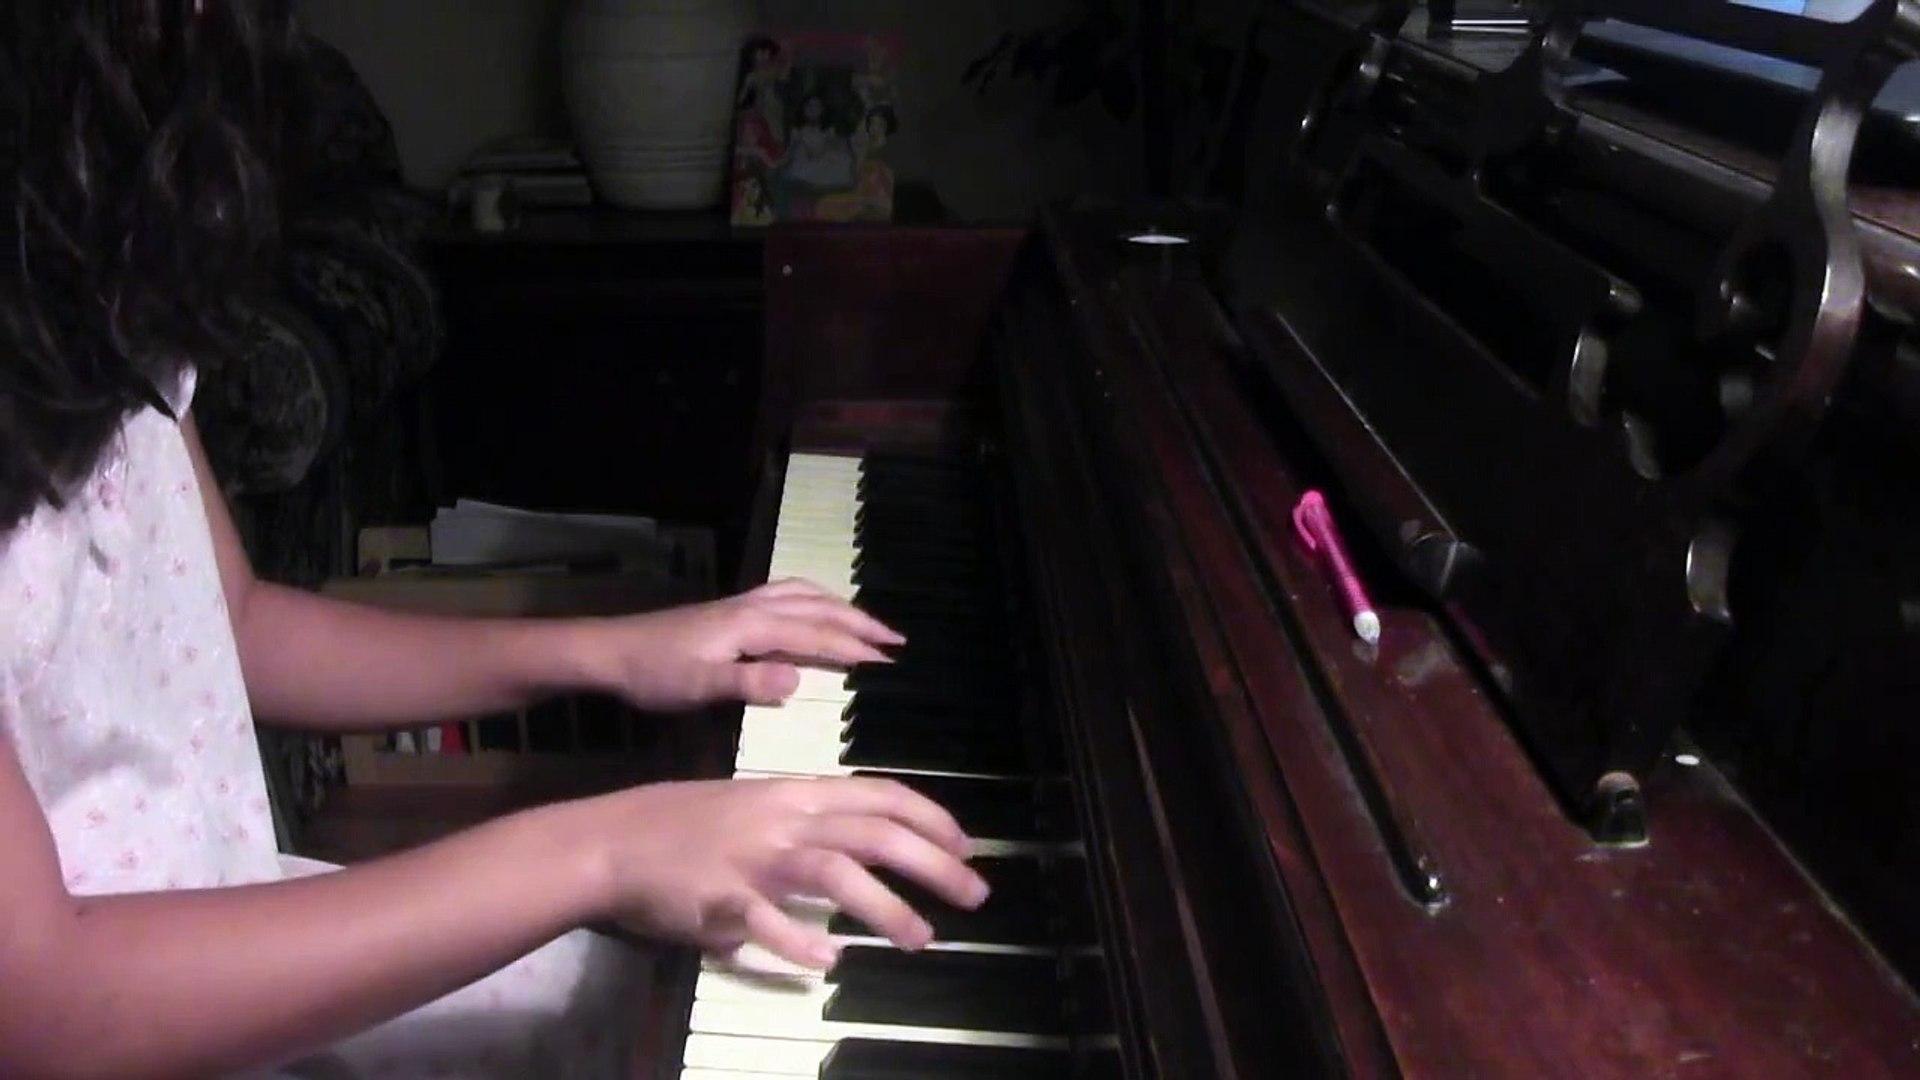 Shounen Brave (Brave Boy) - Kagerou Project Piano Cover